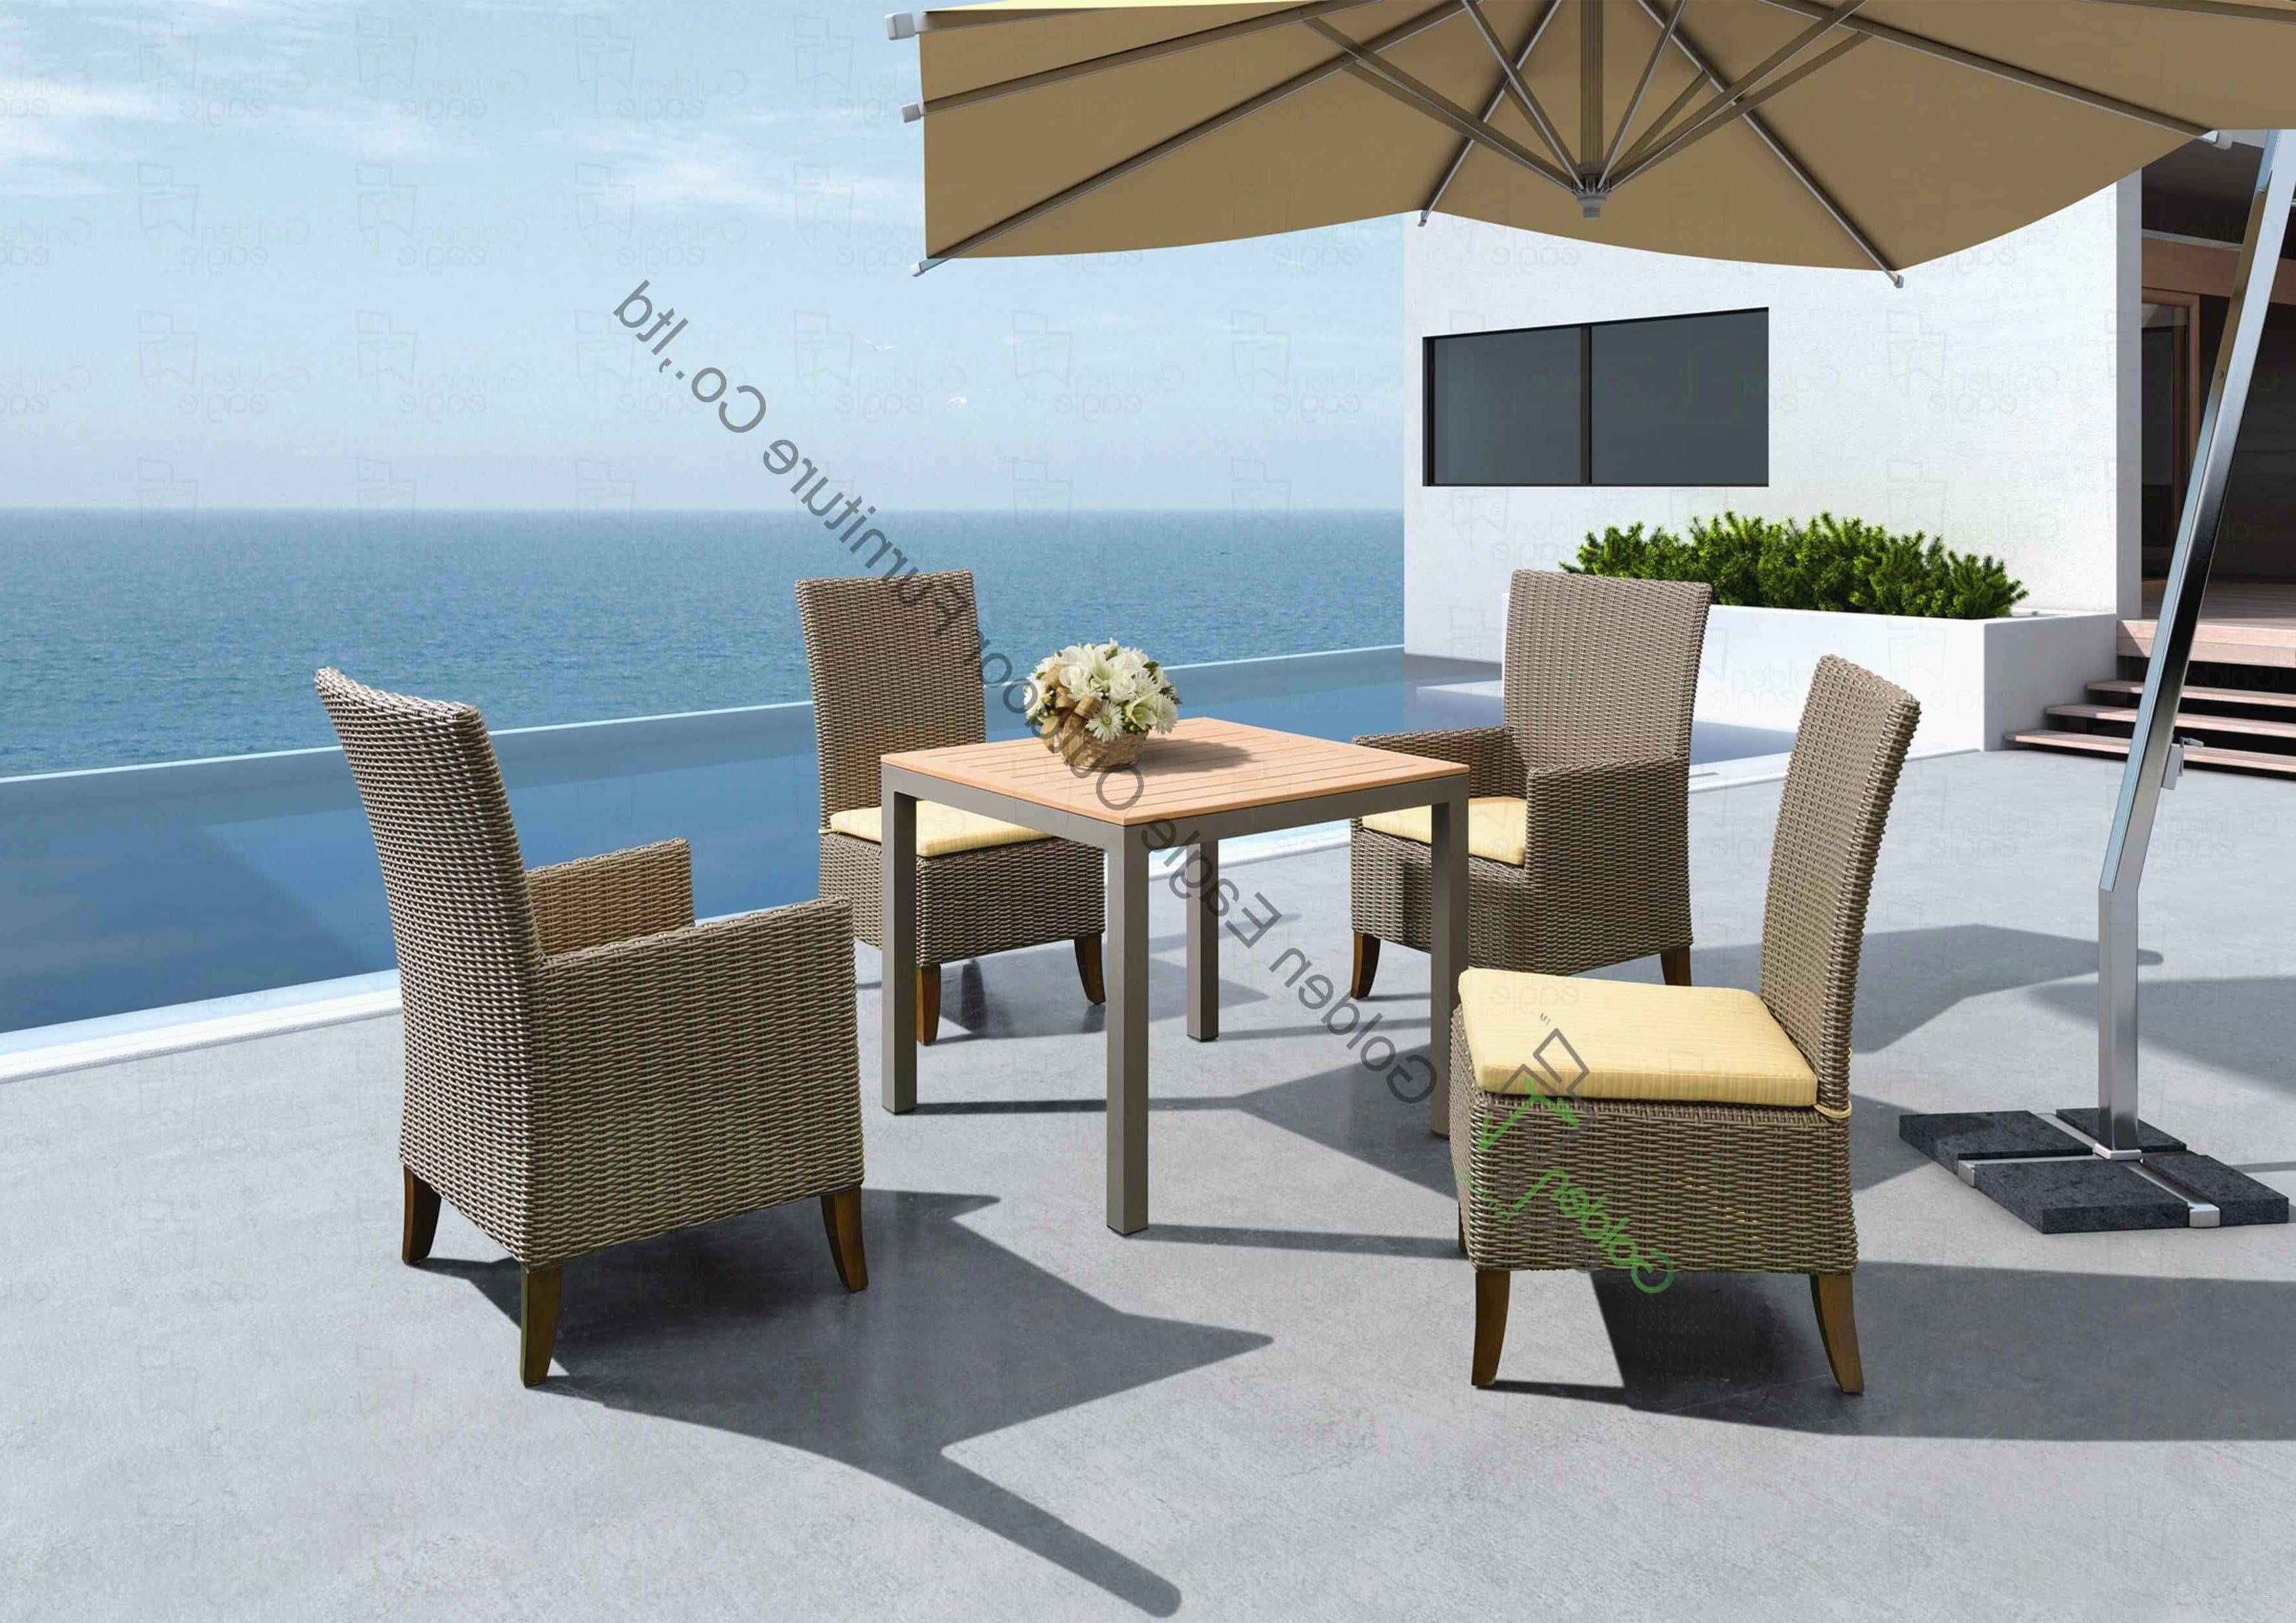 Outdoor Patio Umbrellas Within 2018 Patio Furniture With Umbrella Best Of Outdoor Patio Umbrellas (View 14 of 20)